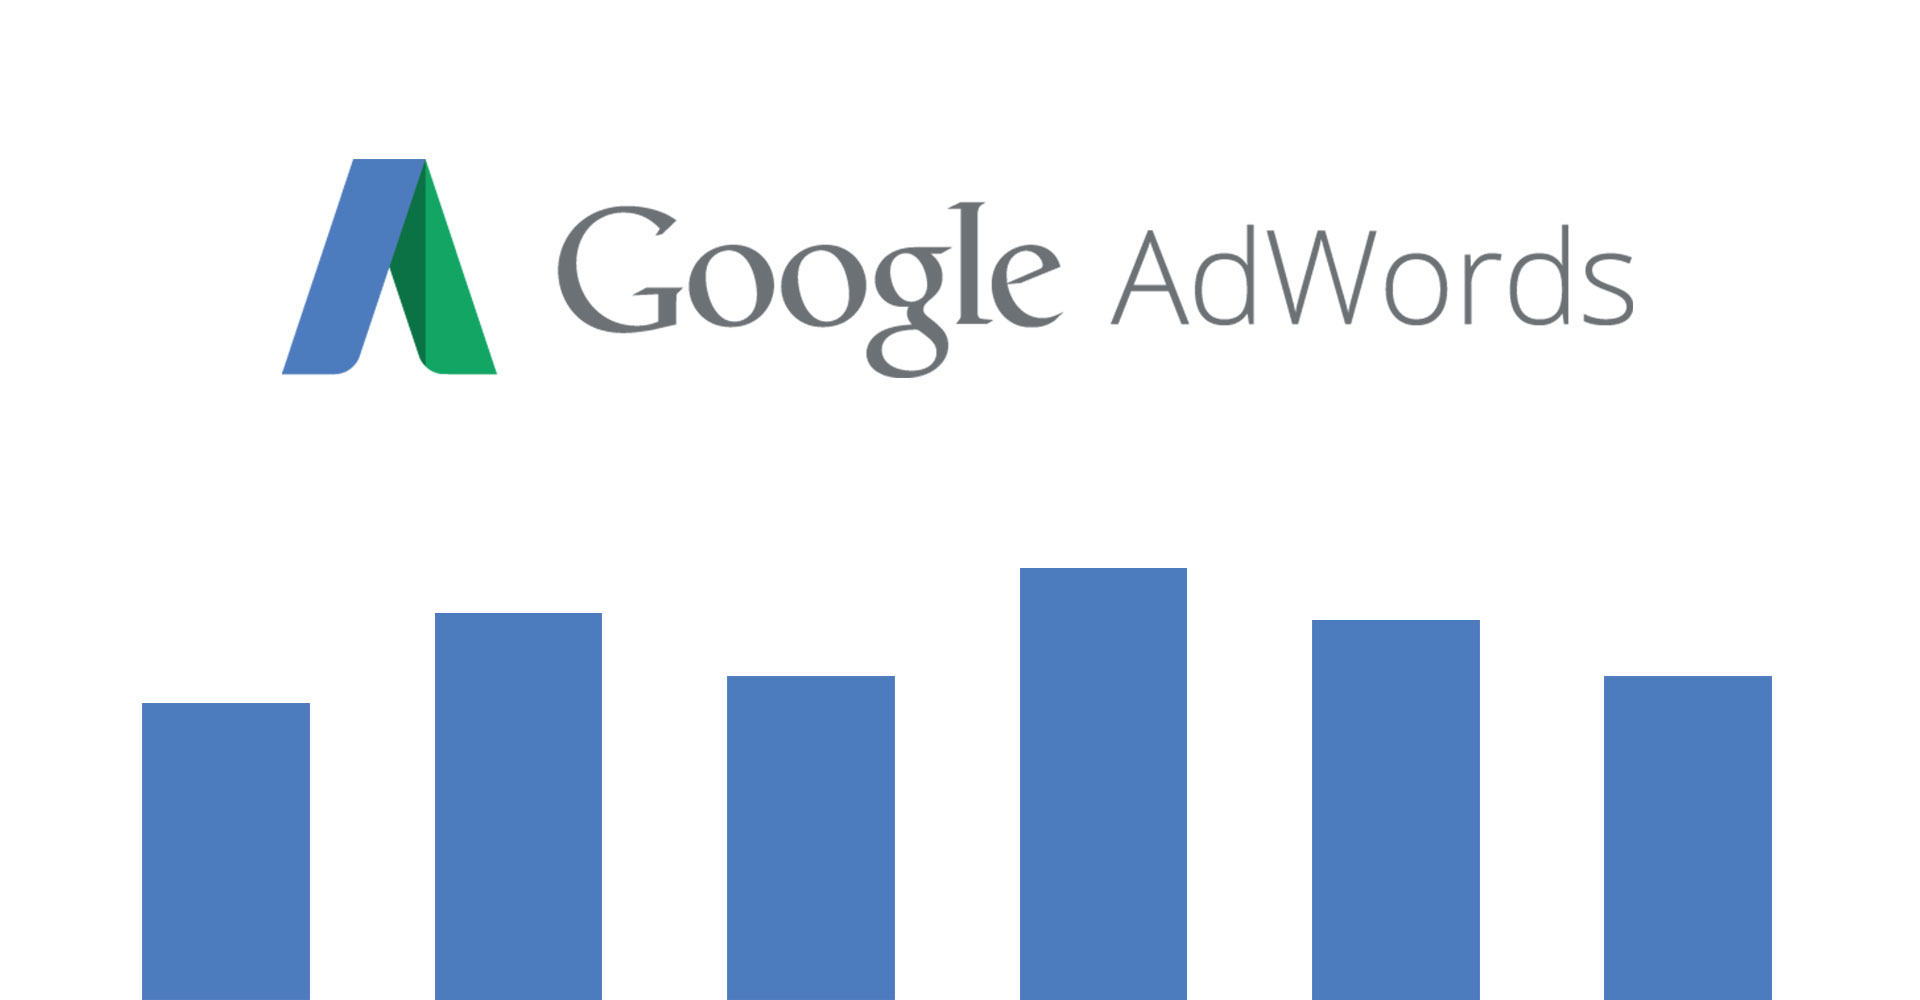 Google Adwordsの登録方法を易しく解説!キーワードプランナーを使うための準備編【2016年9月】